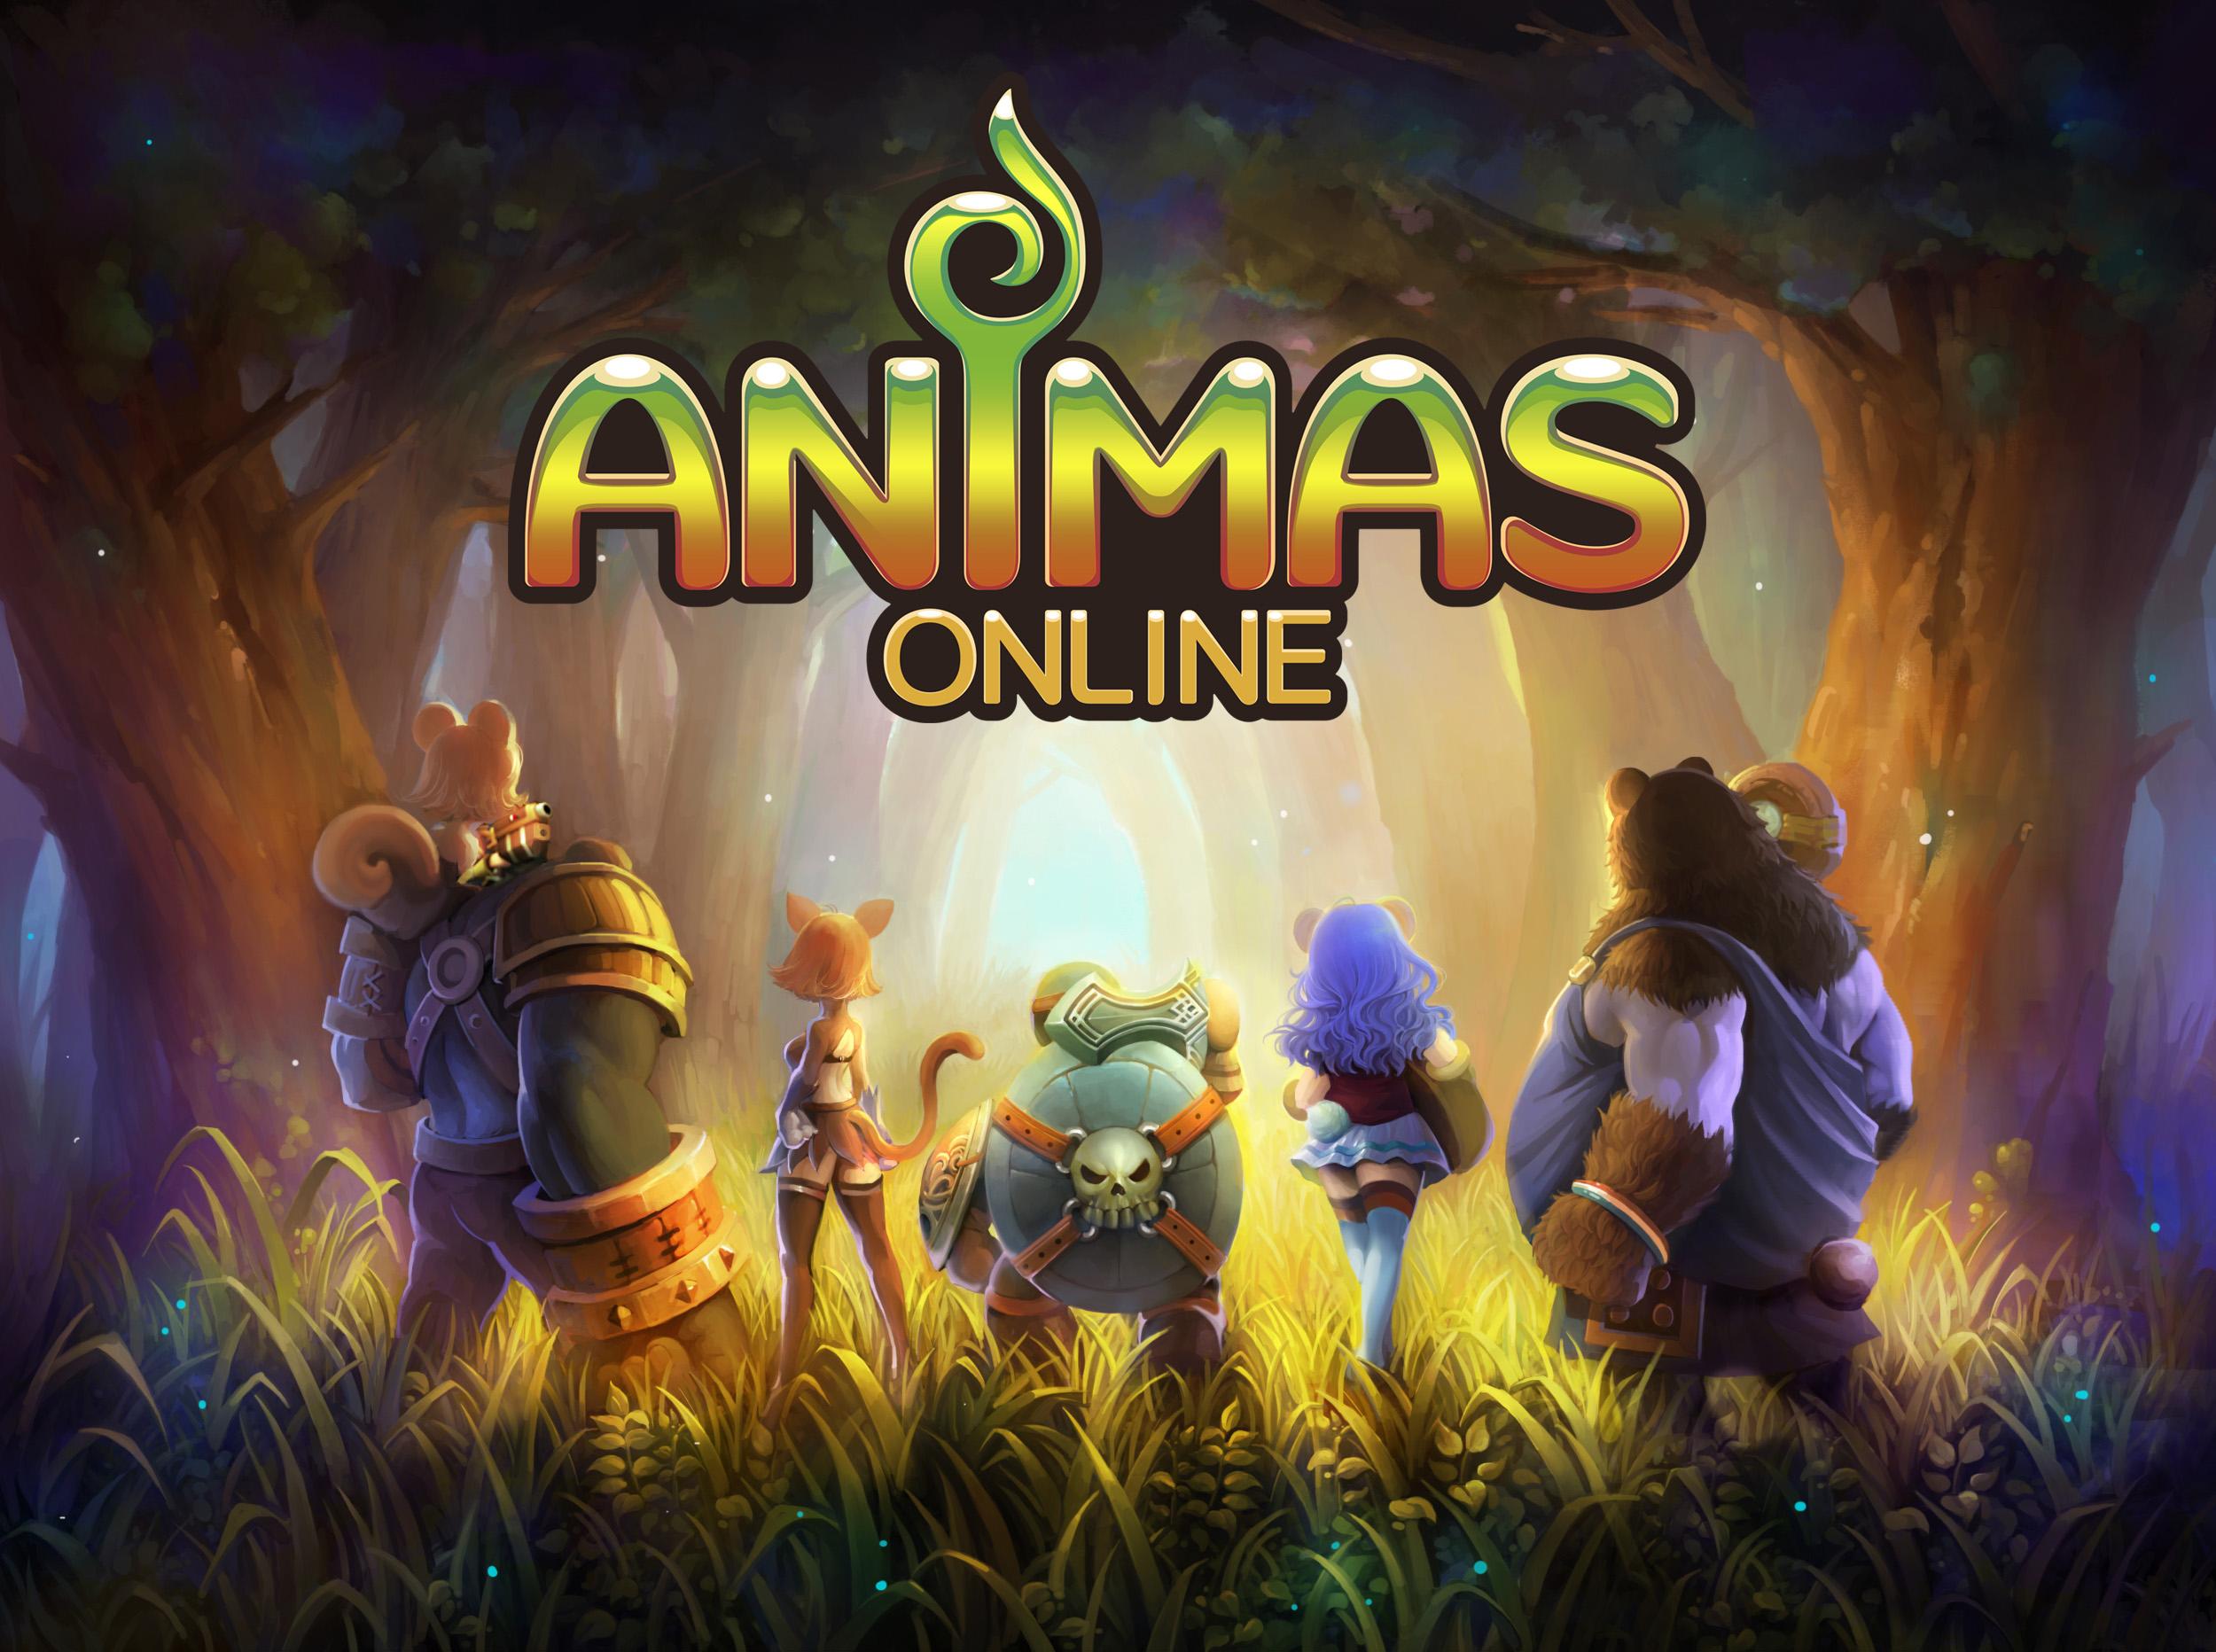 Animas Online sur mobile !